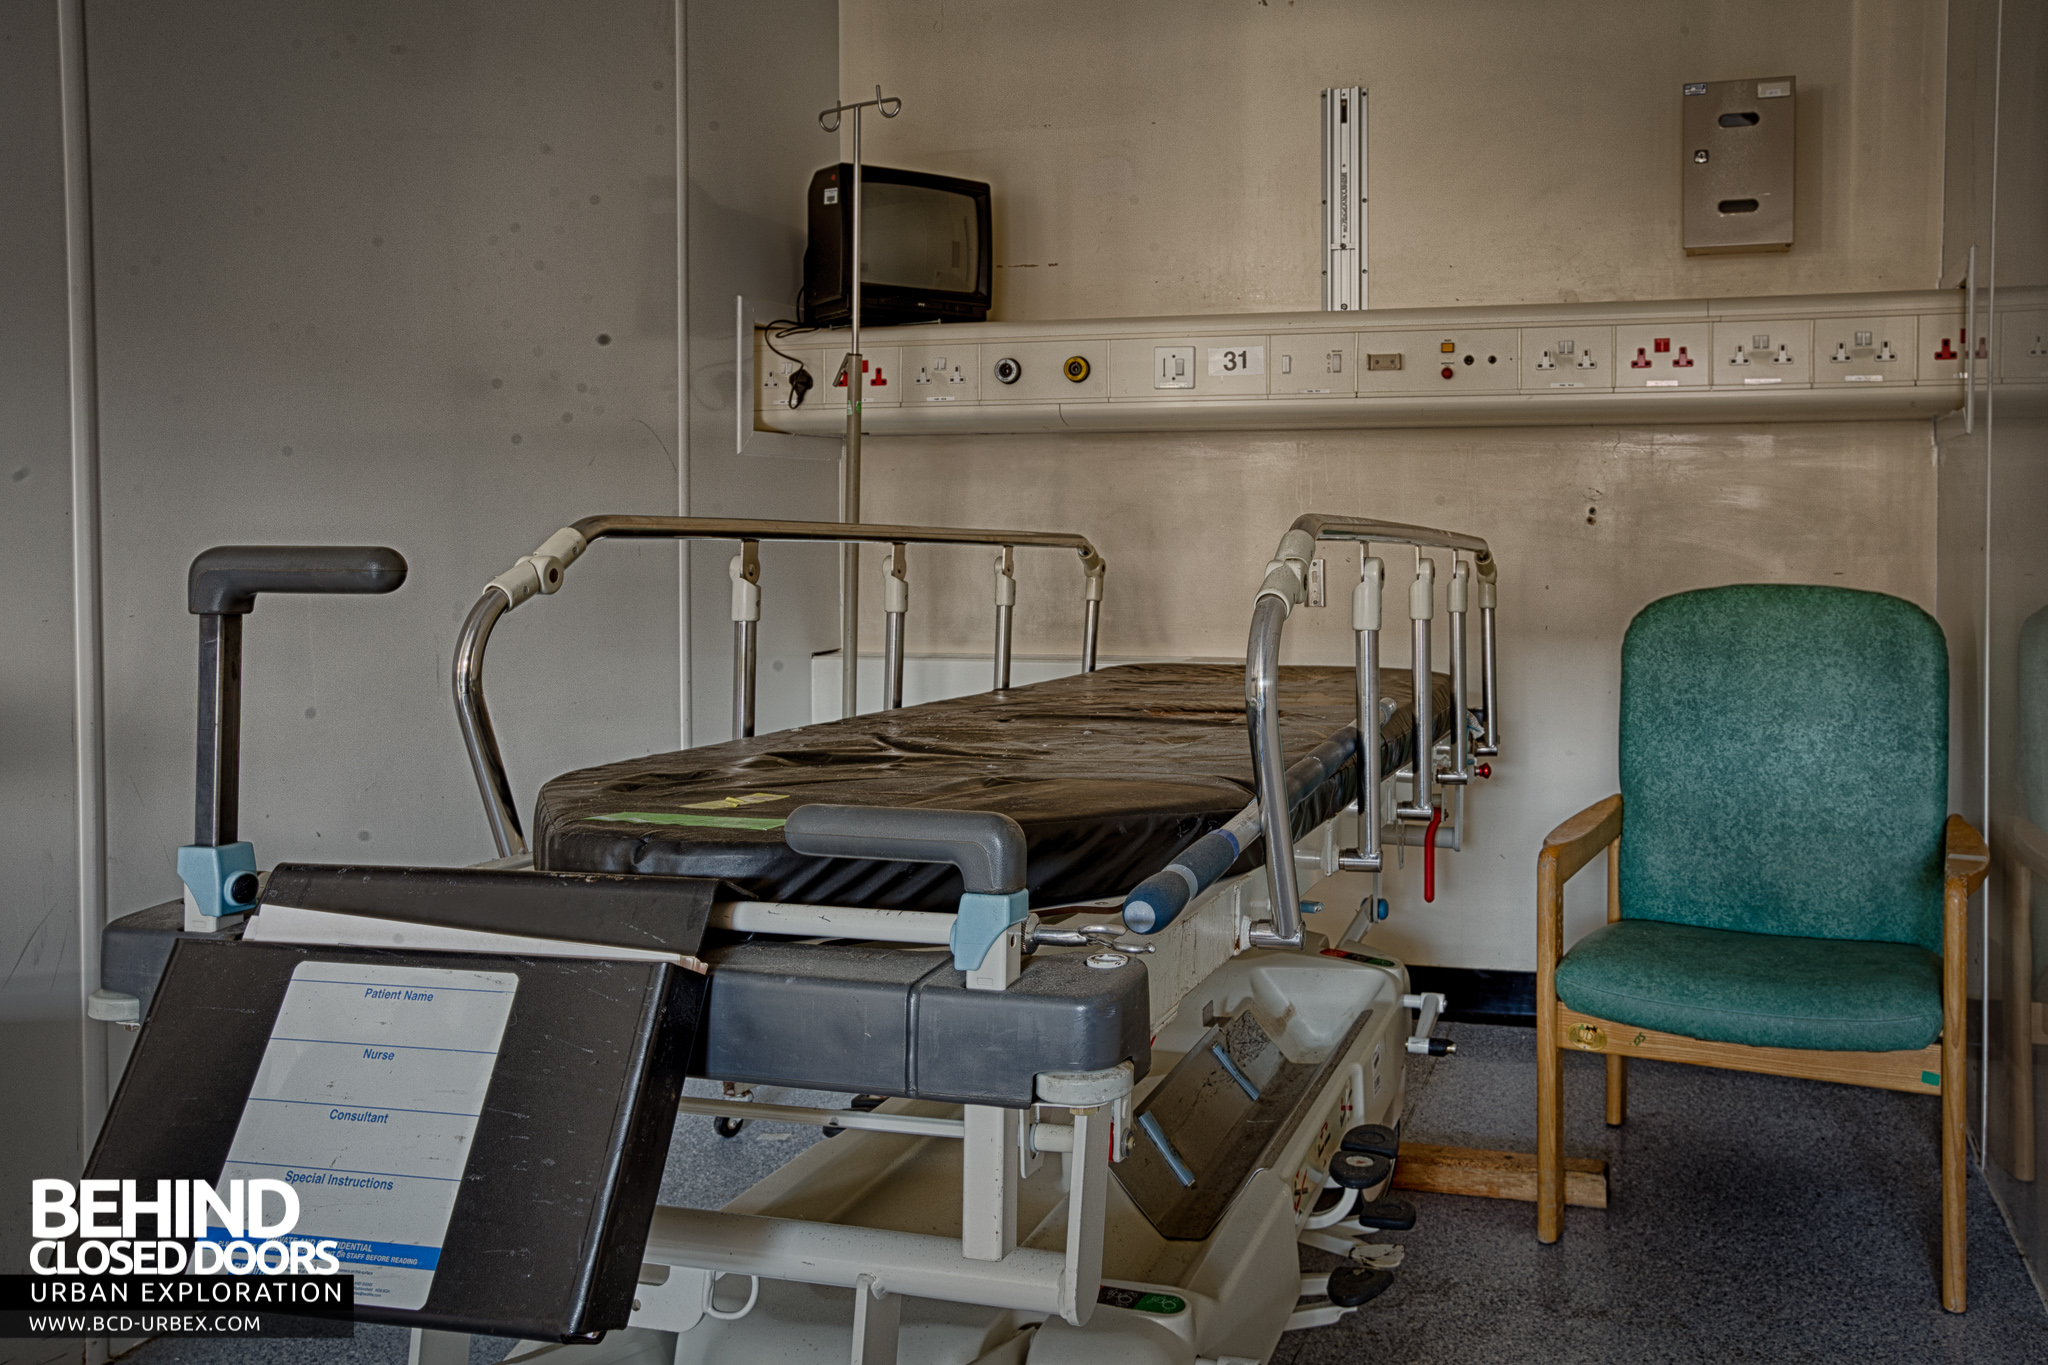 Selly Oak Hospital Bed In A Ward Room